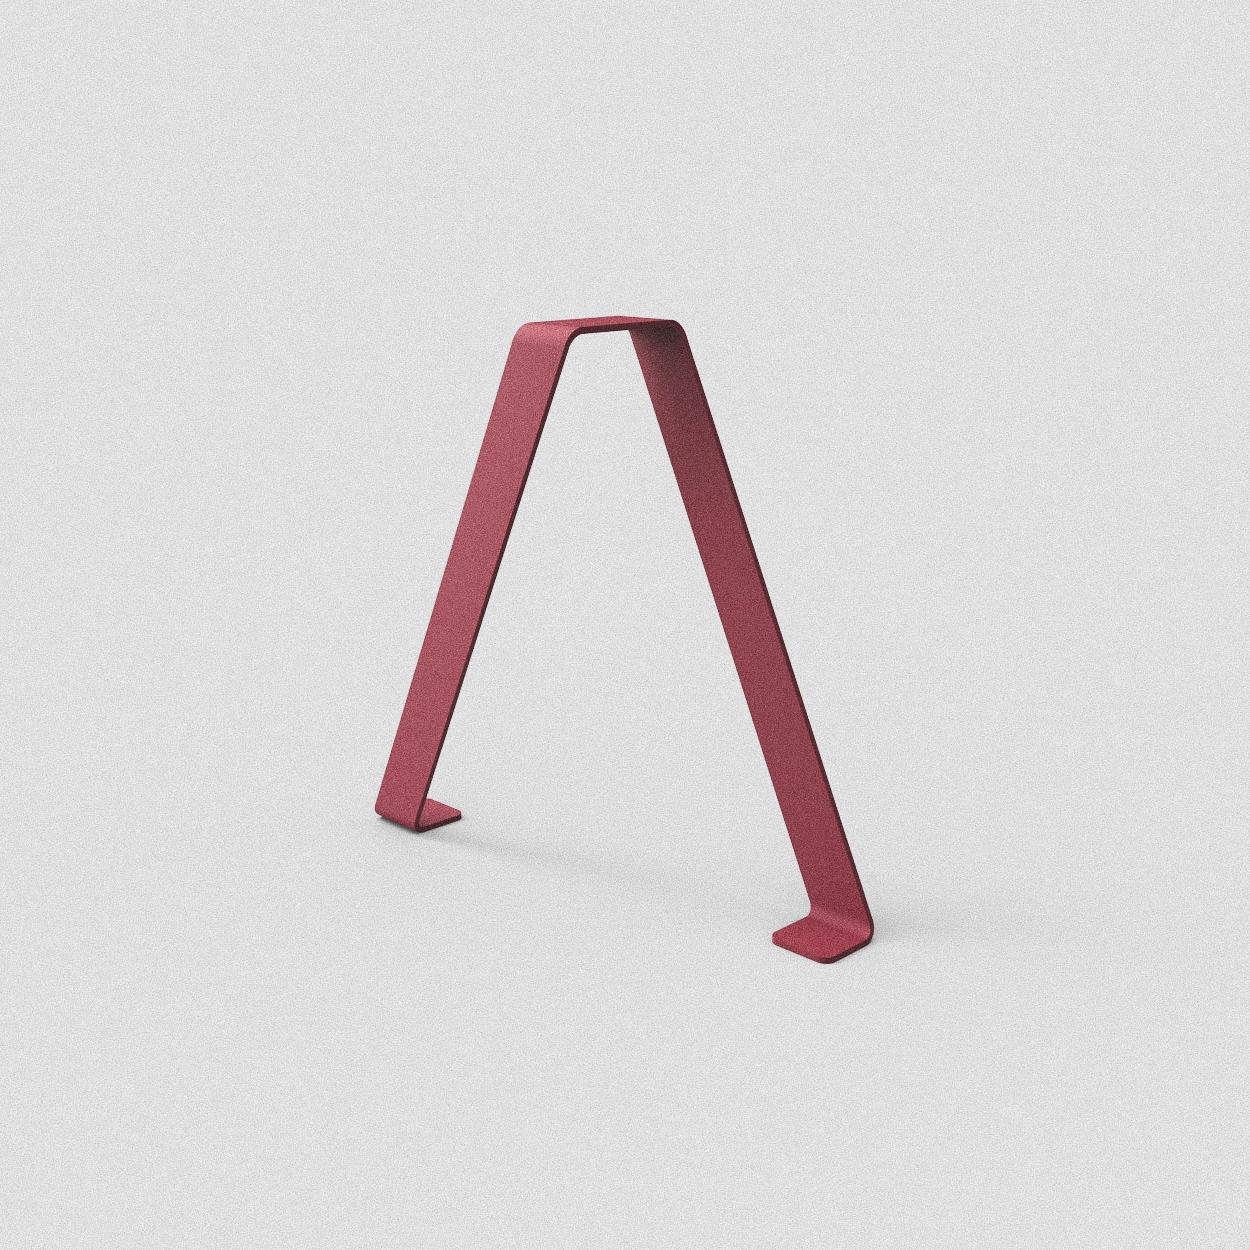 Standardfärg: Lingon